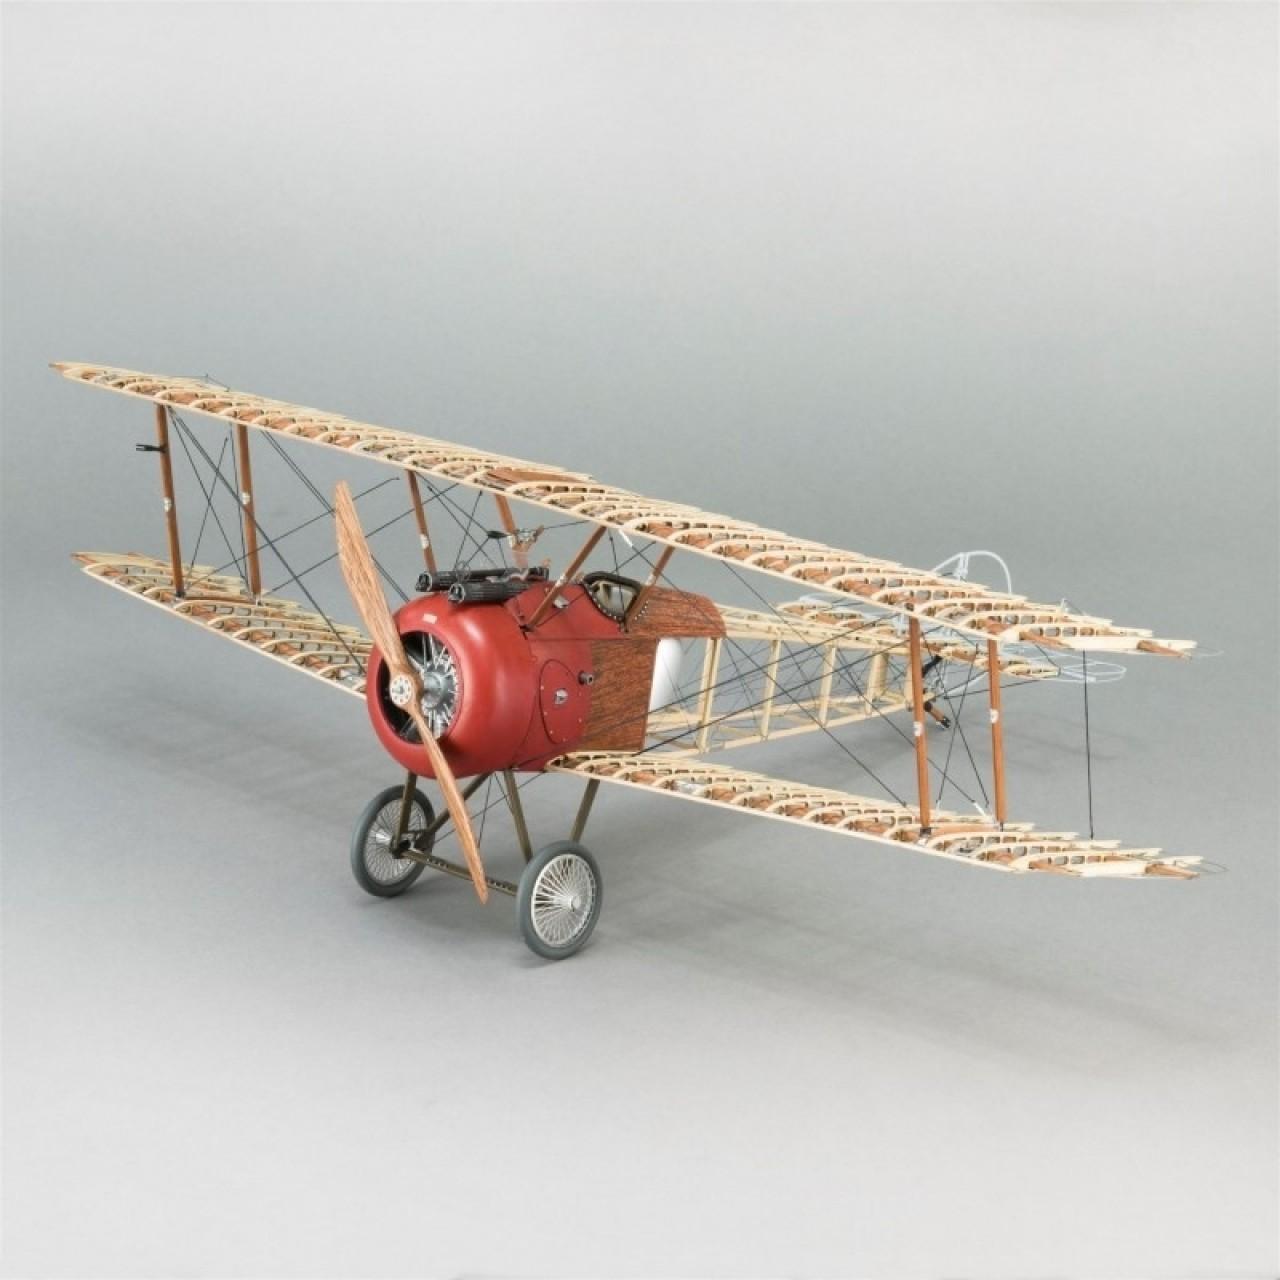 cortado con l/áser kit de madera de balsa KIT DE Sopwith Camel Slowflyer escala 1//20 505 mm de envergadura 245 x 380 x 128 mm de tama/ño modelo de avi/ón para la auto construcci/ón kit modelo RC